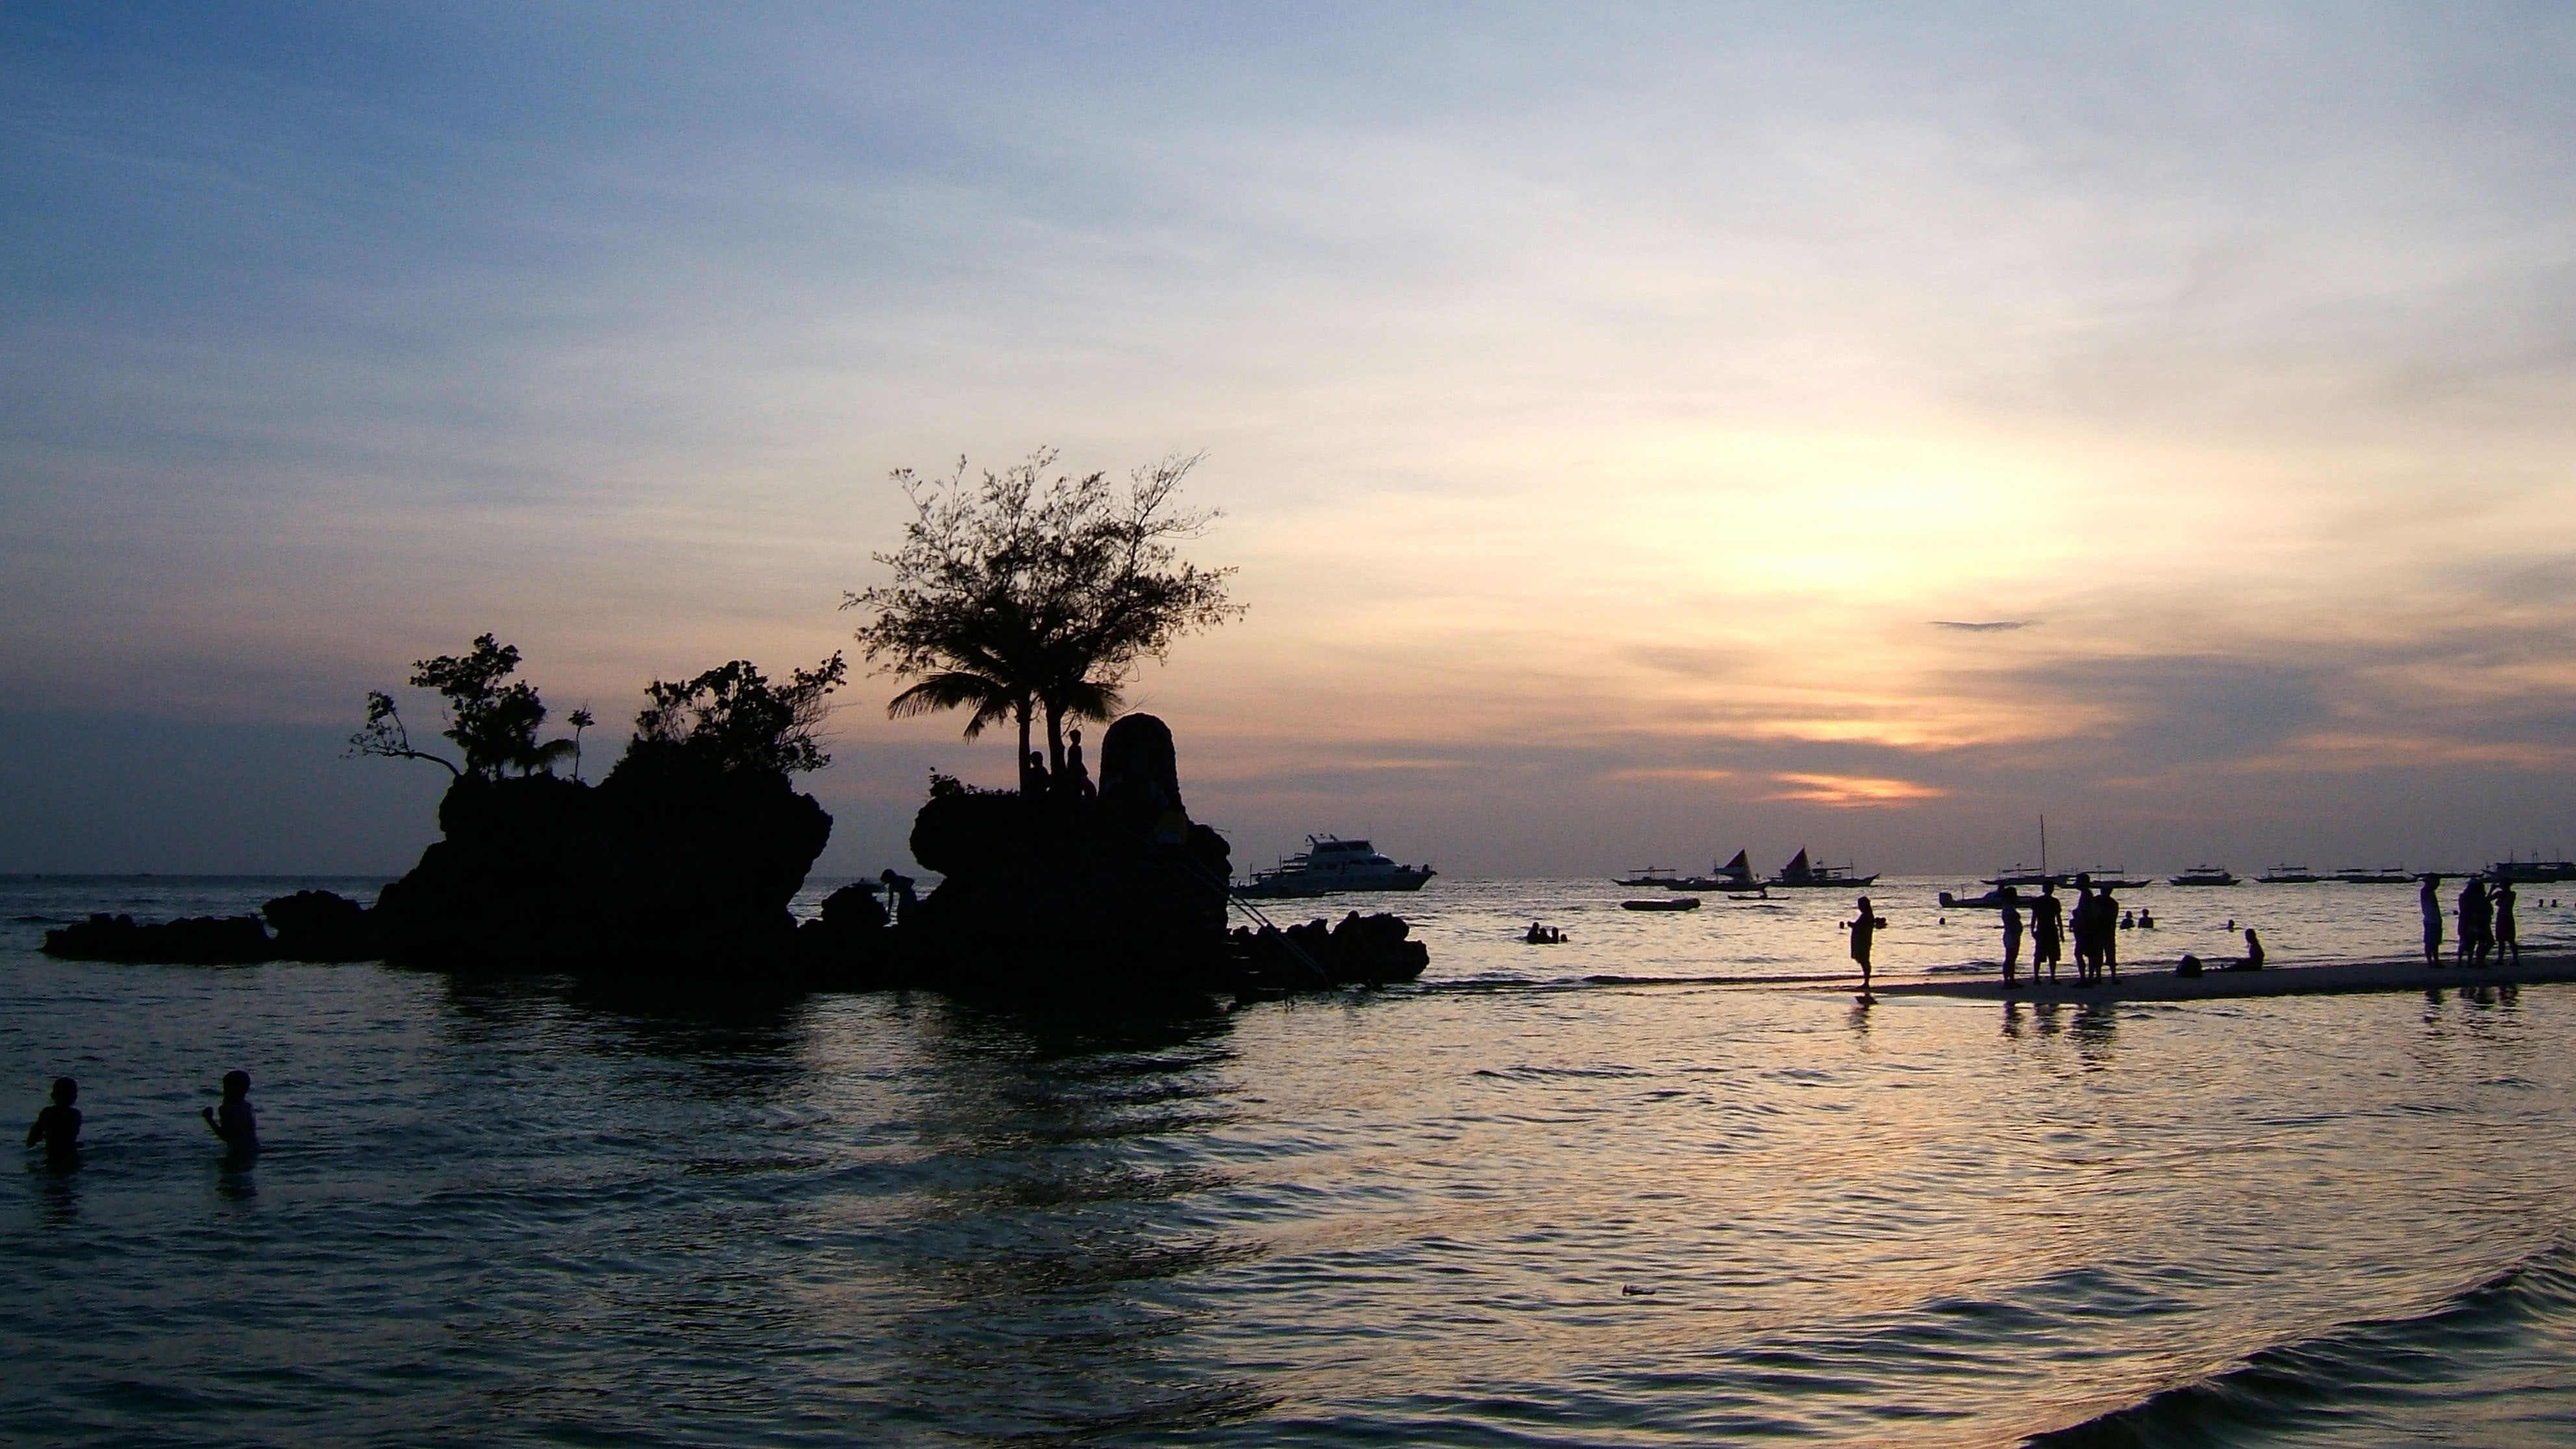 Philippines Panay Negros Caticlan Boracay White Beach Sunset Dec 2003 11